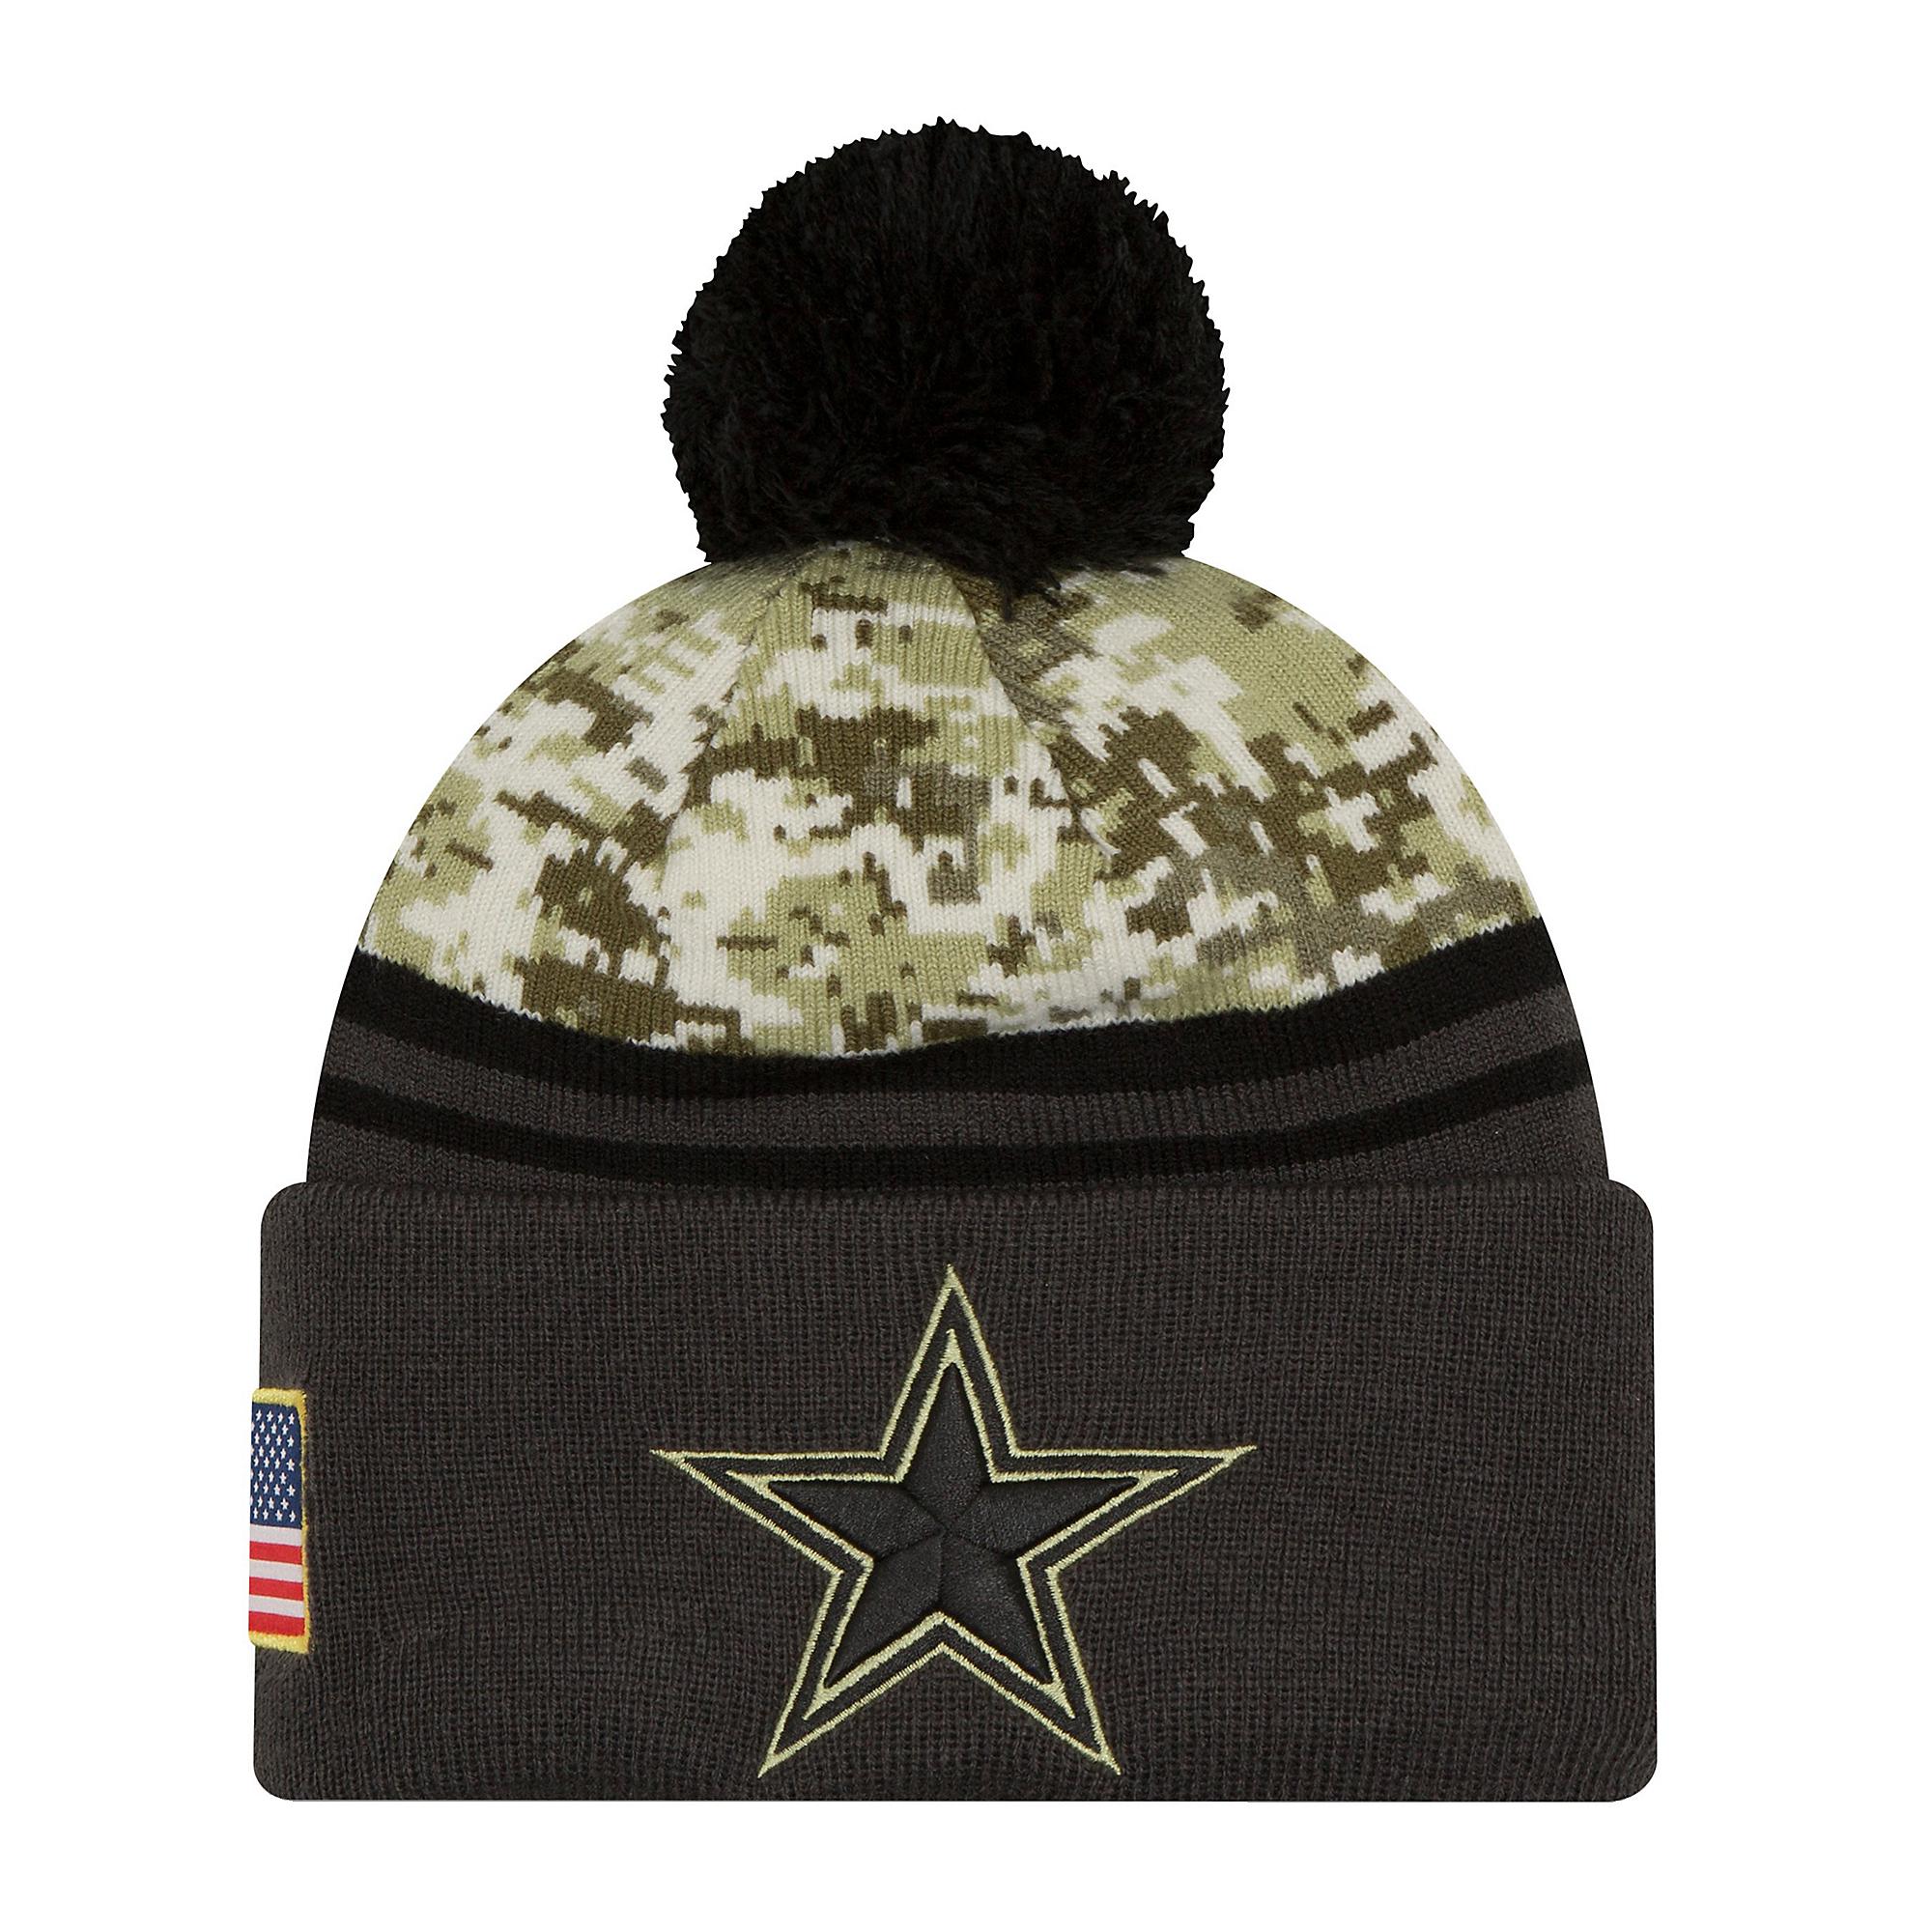 018d6ddc73dc3 Dallas Cowboys New Era Salute to Service Youth Sport Knit Hat   Dallas  Cowboys Pro Shop